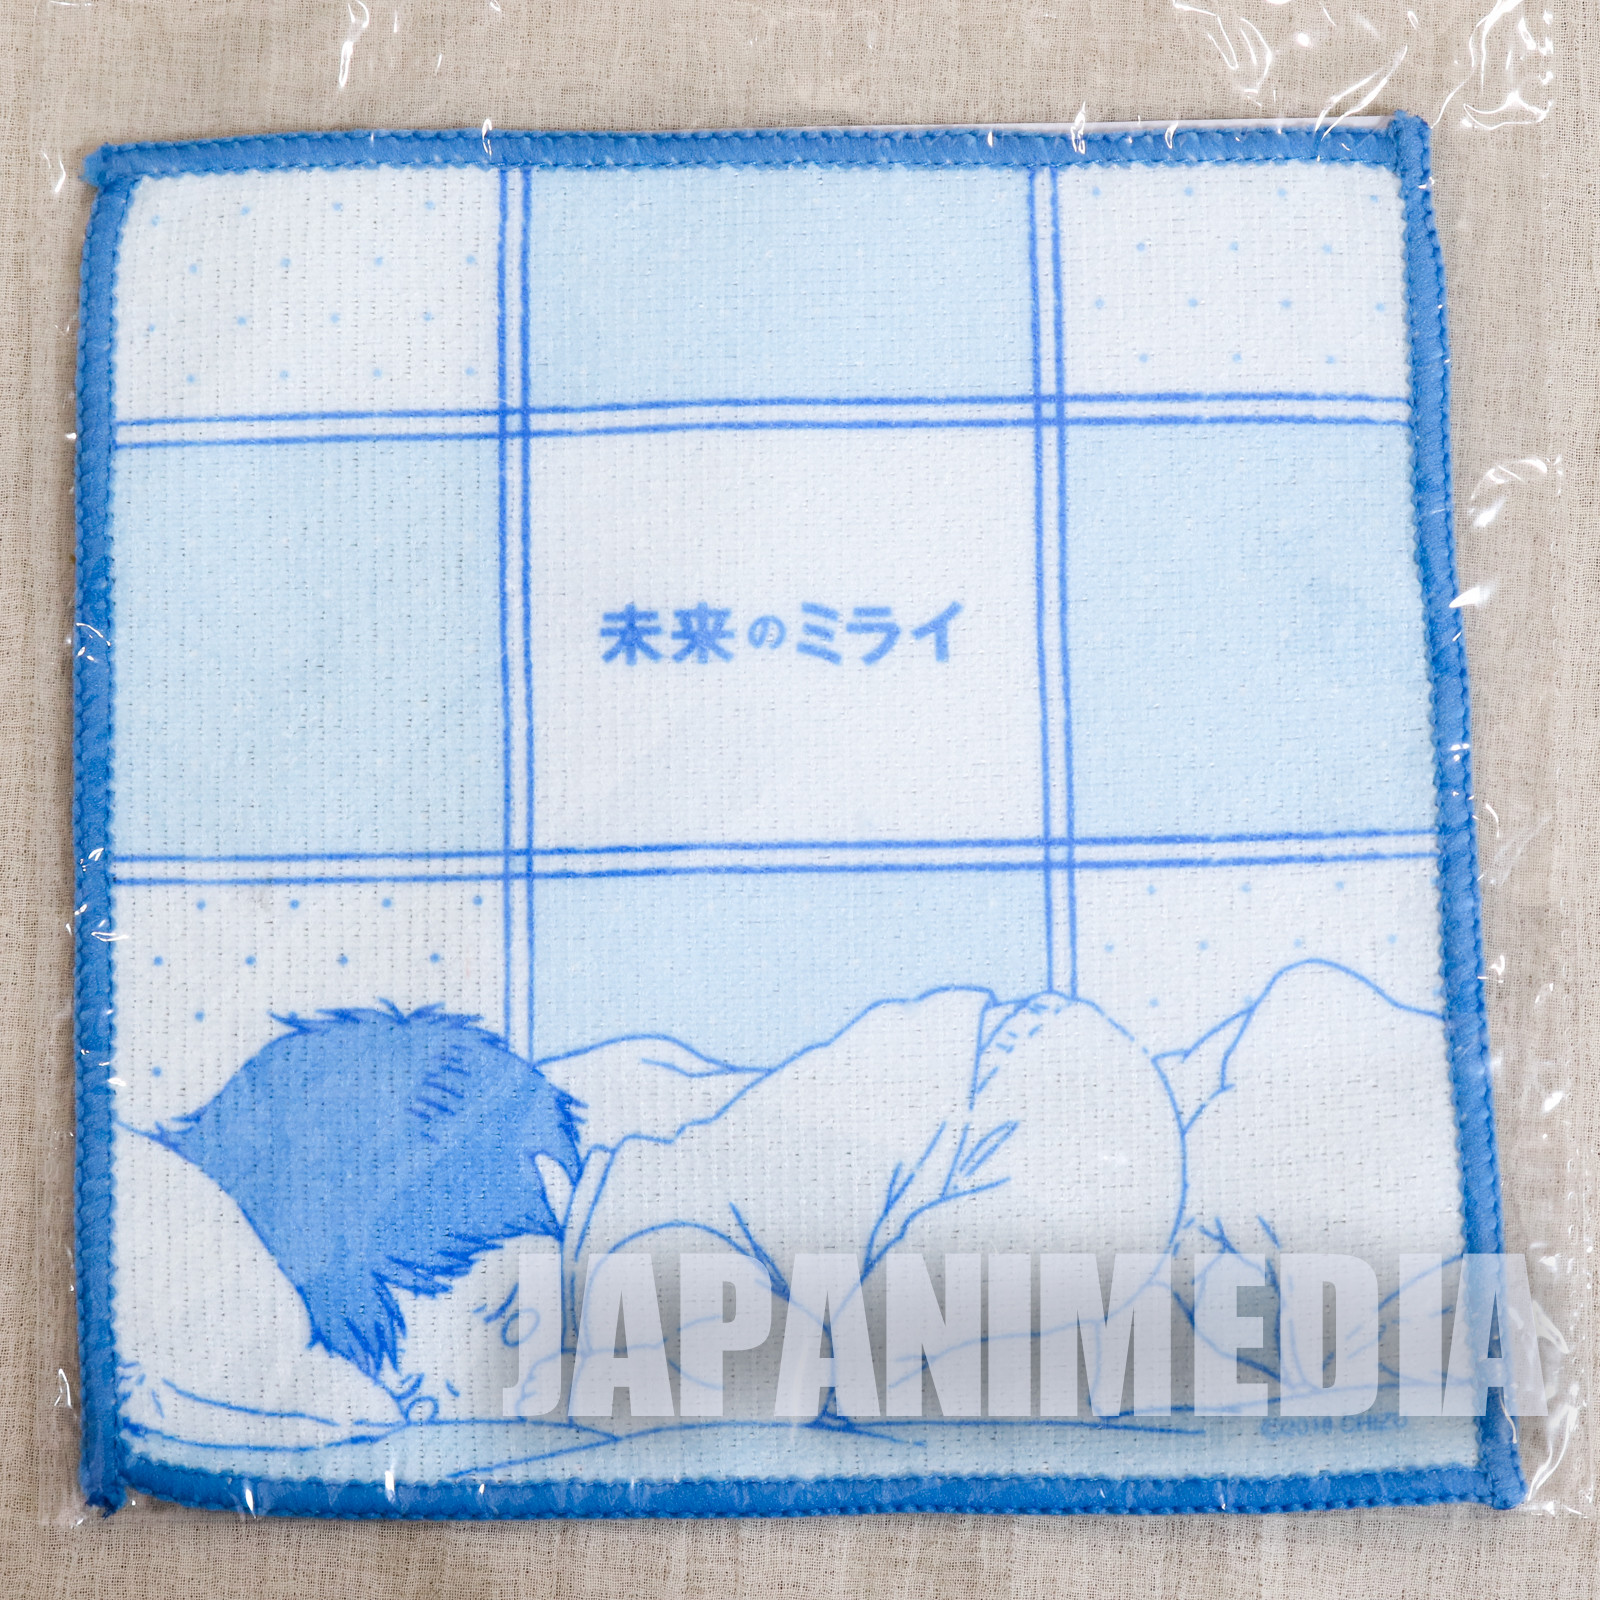 Mirai no Mirai Hand Towel 7x7 inch JAPAN ANIME